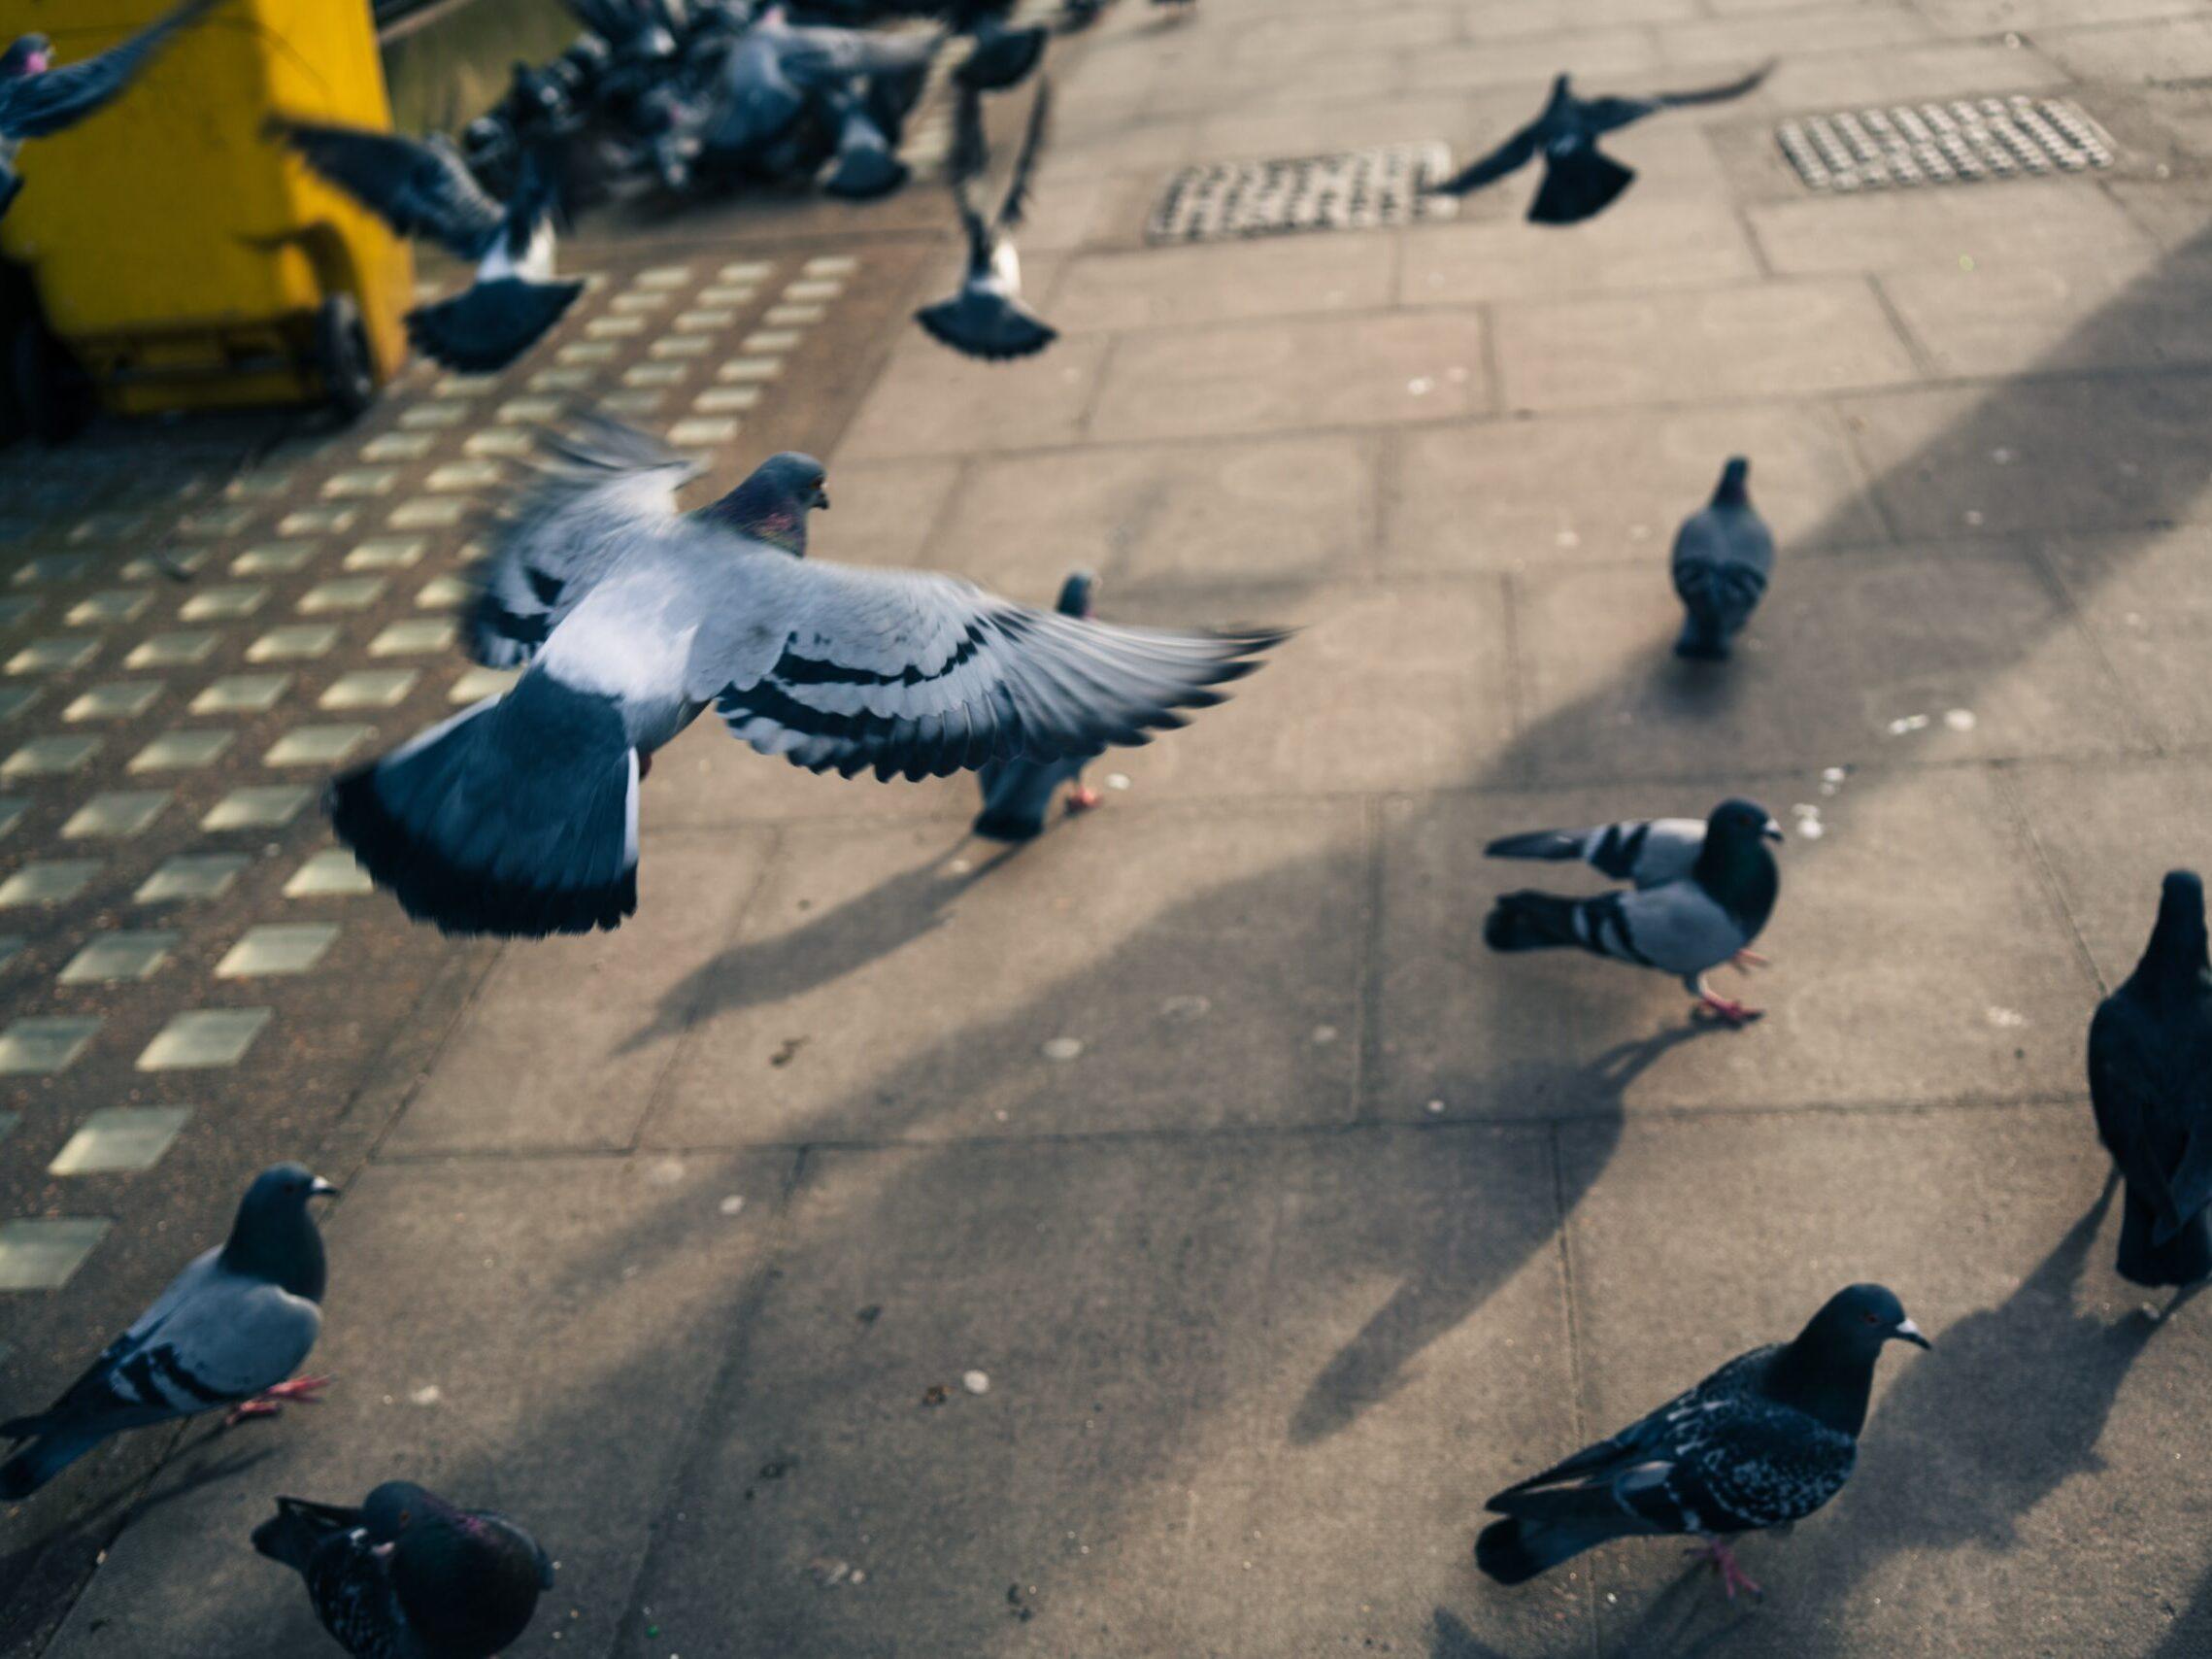 flock of pigeons on gray concrete floor